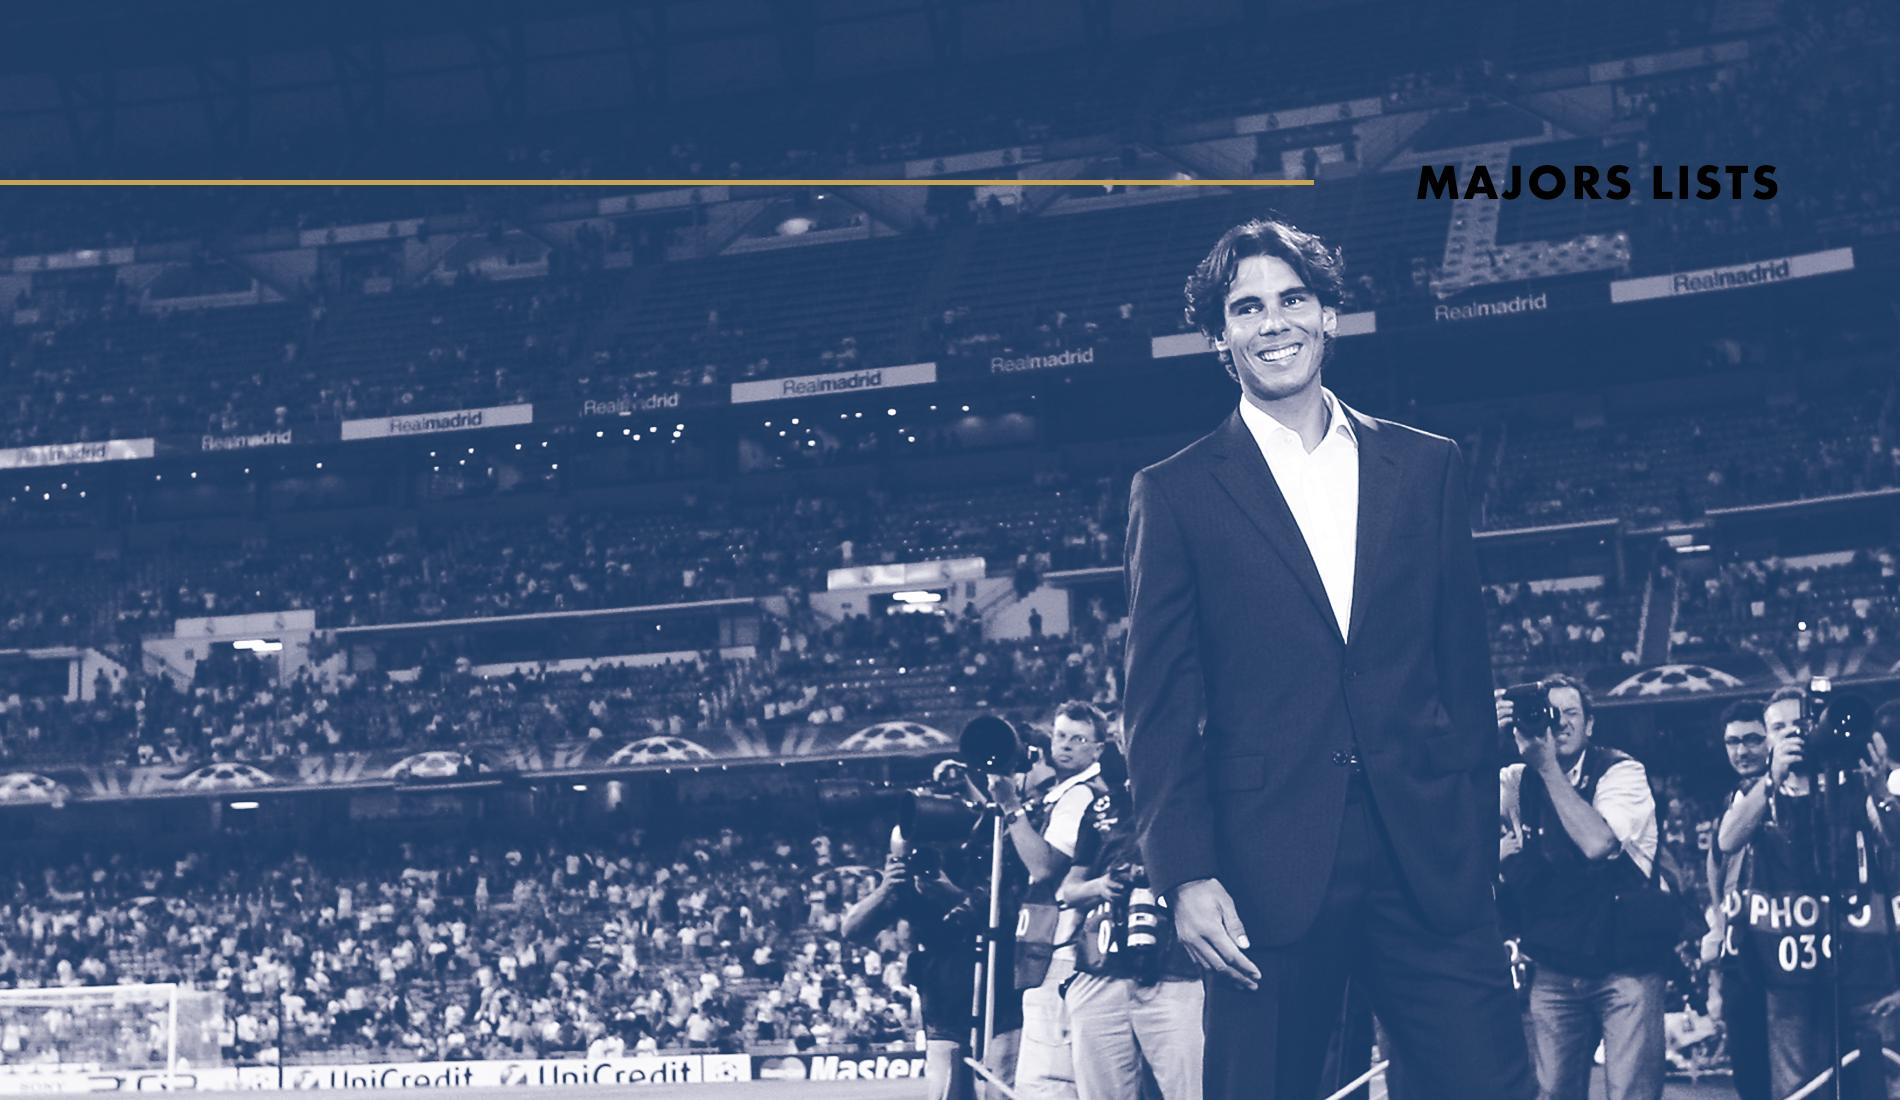 Rafael Nadal - Real Madrid : Tennis Majors Lists